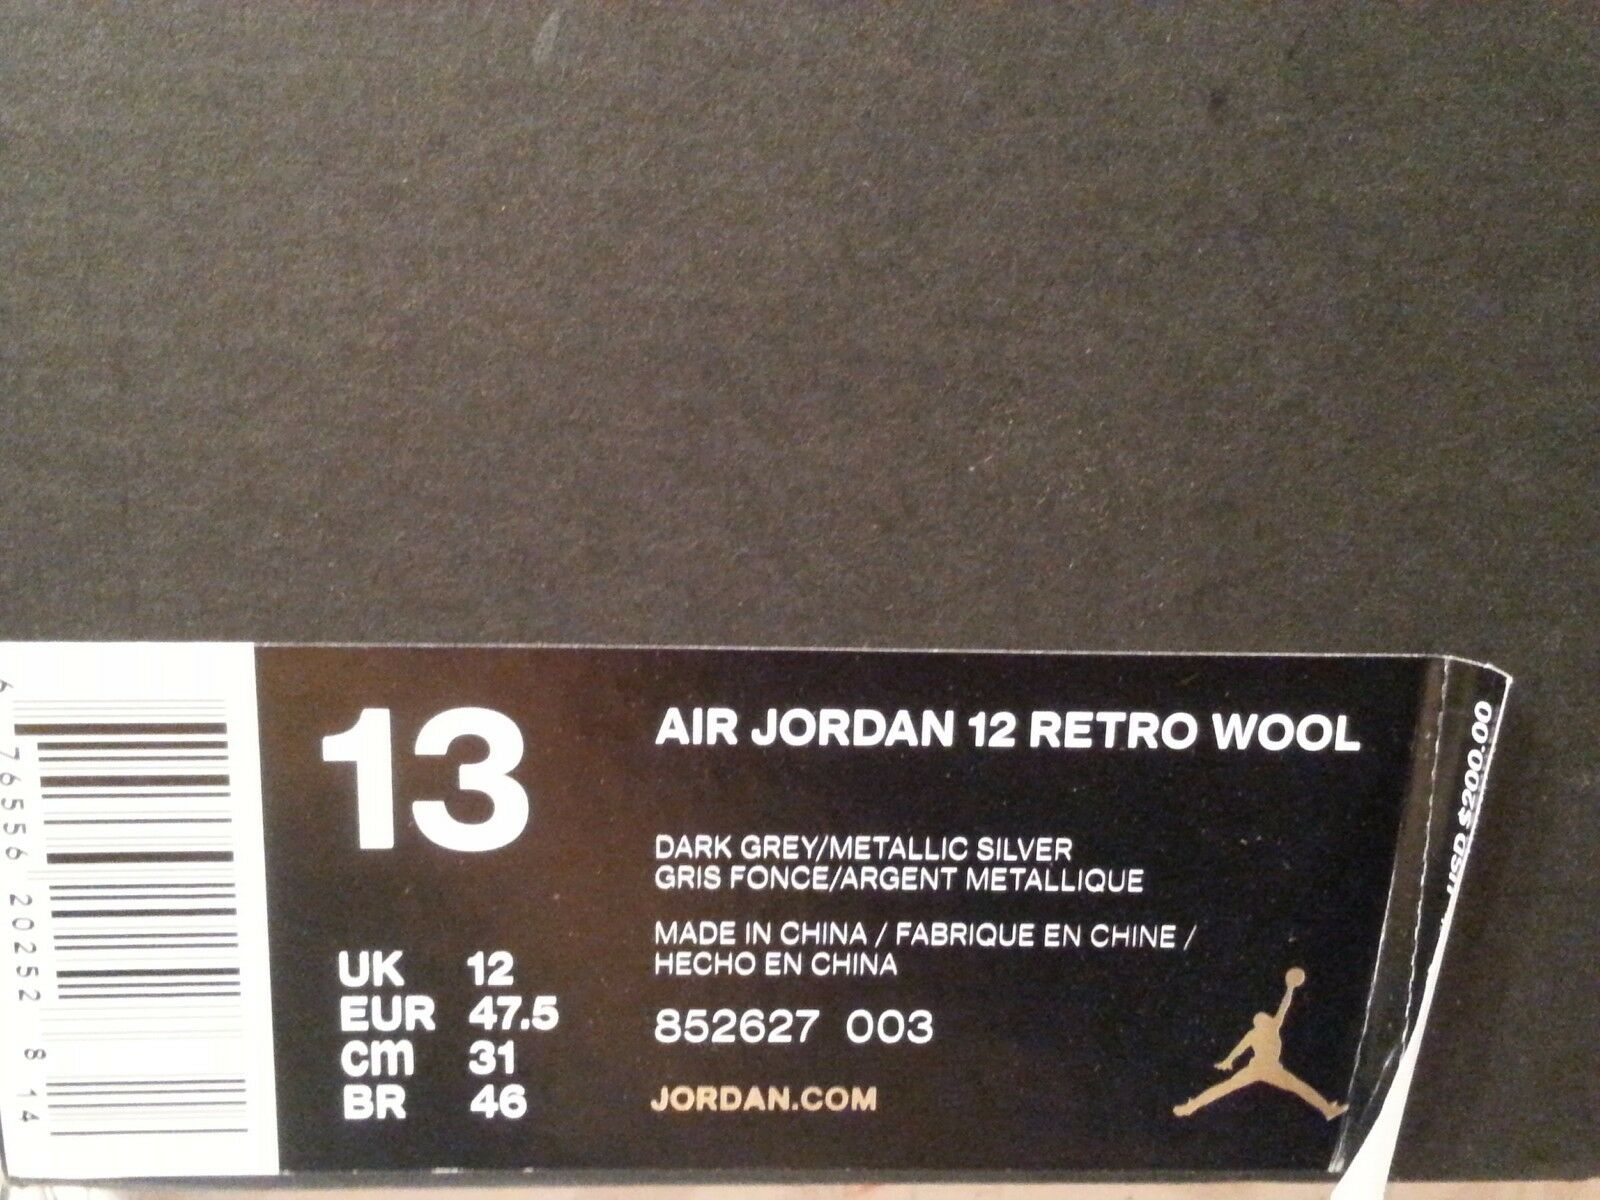 2016 Nike Air Jordan 12 XII Retro Wool Size 13. 13. 13. 852627-003 1 2 3 4 5 6 b8098b